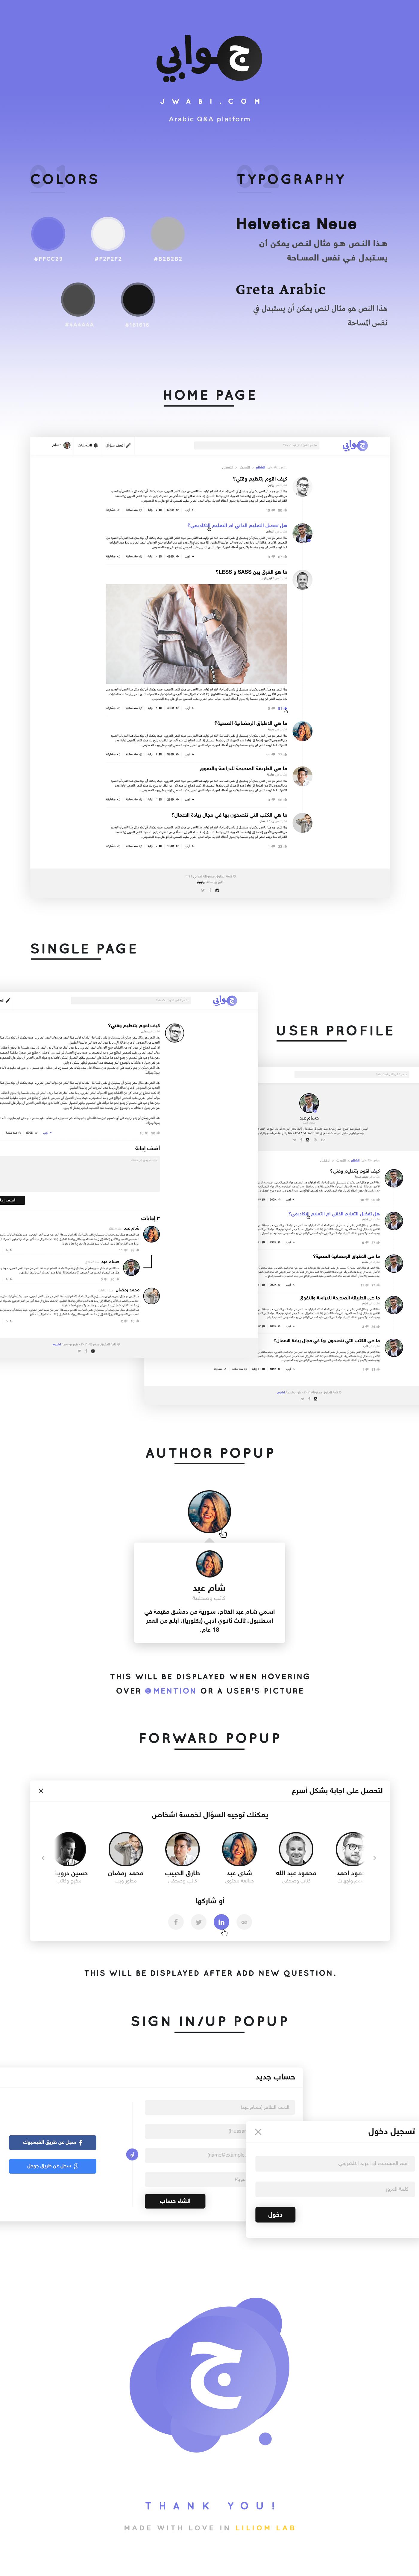 rtl arabic q&a ux UI Website design discussion community comments